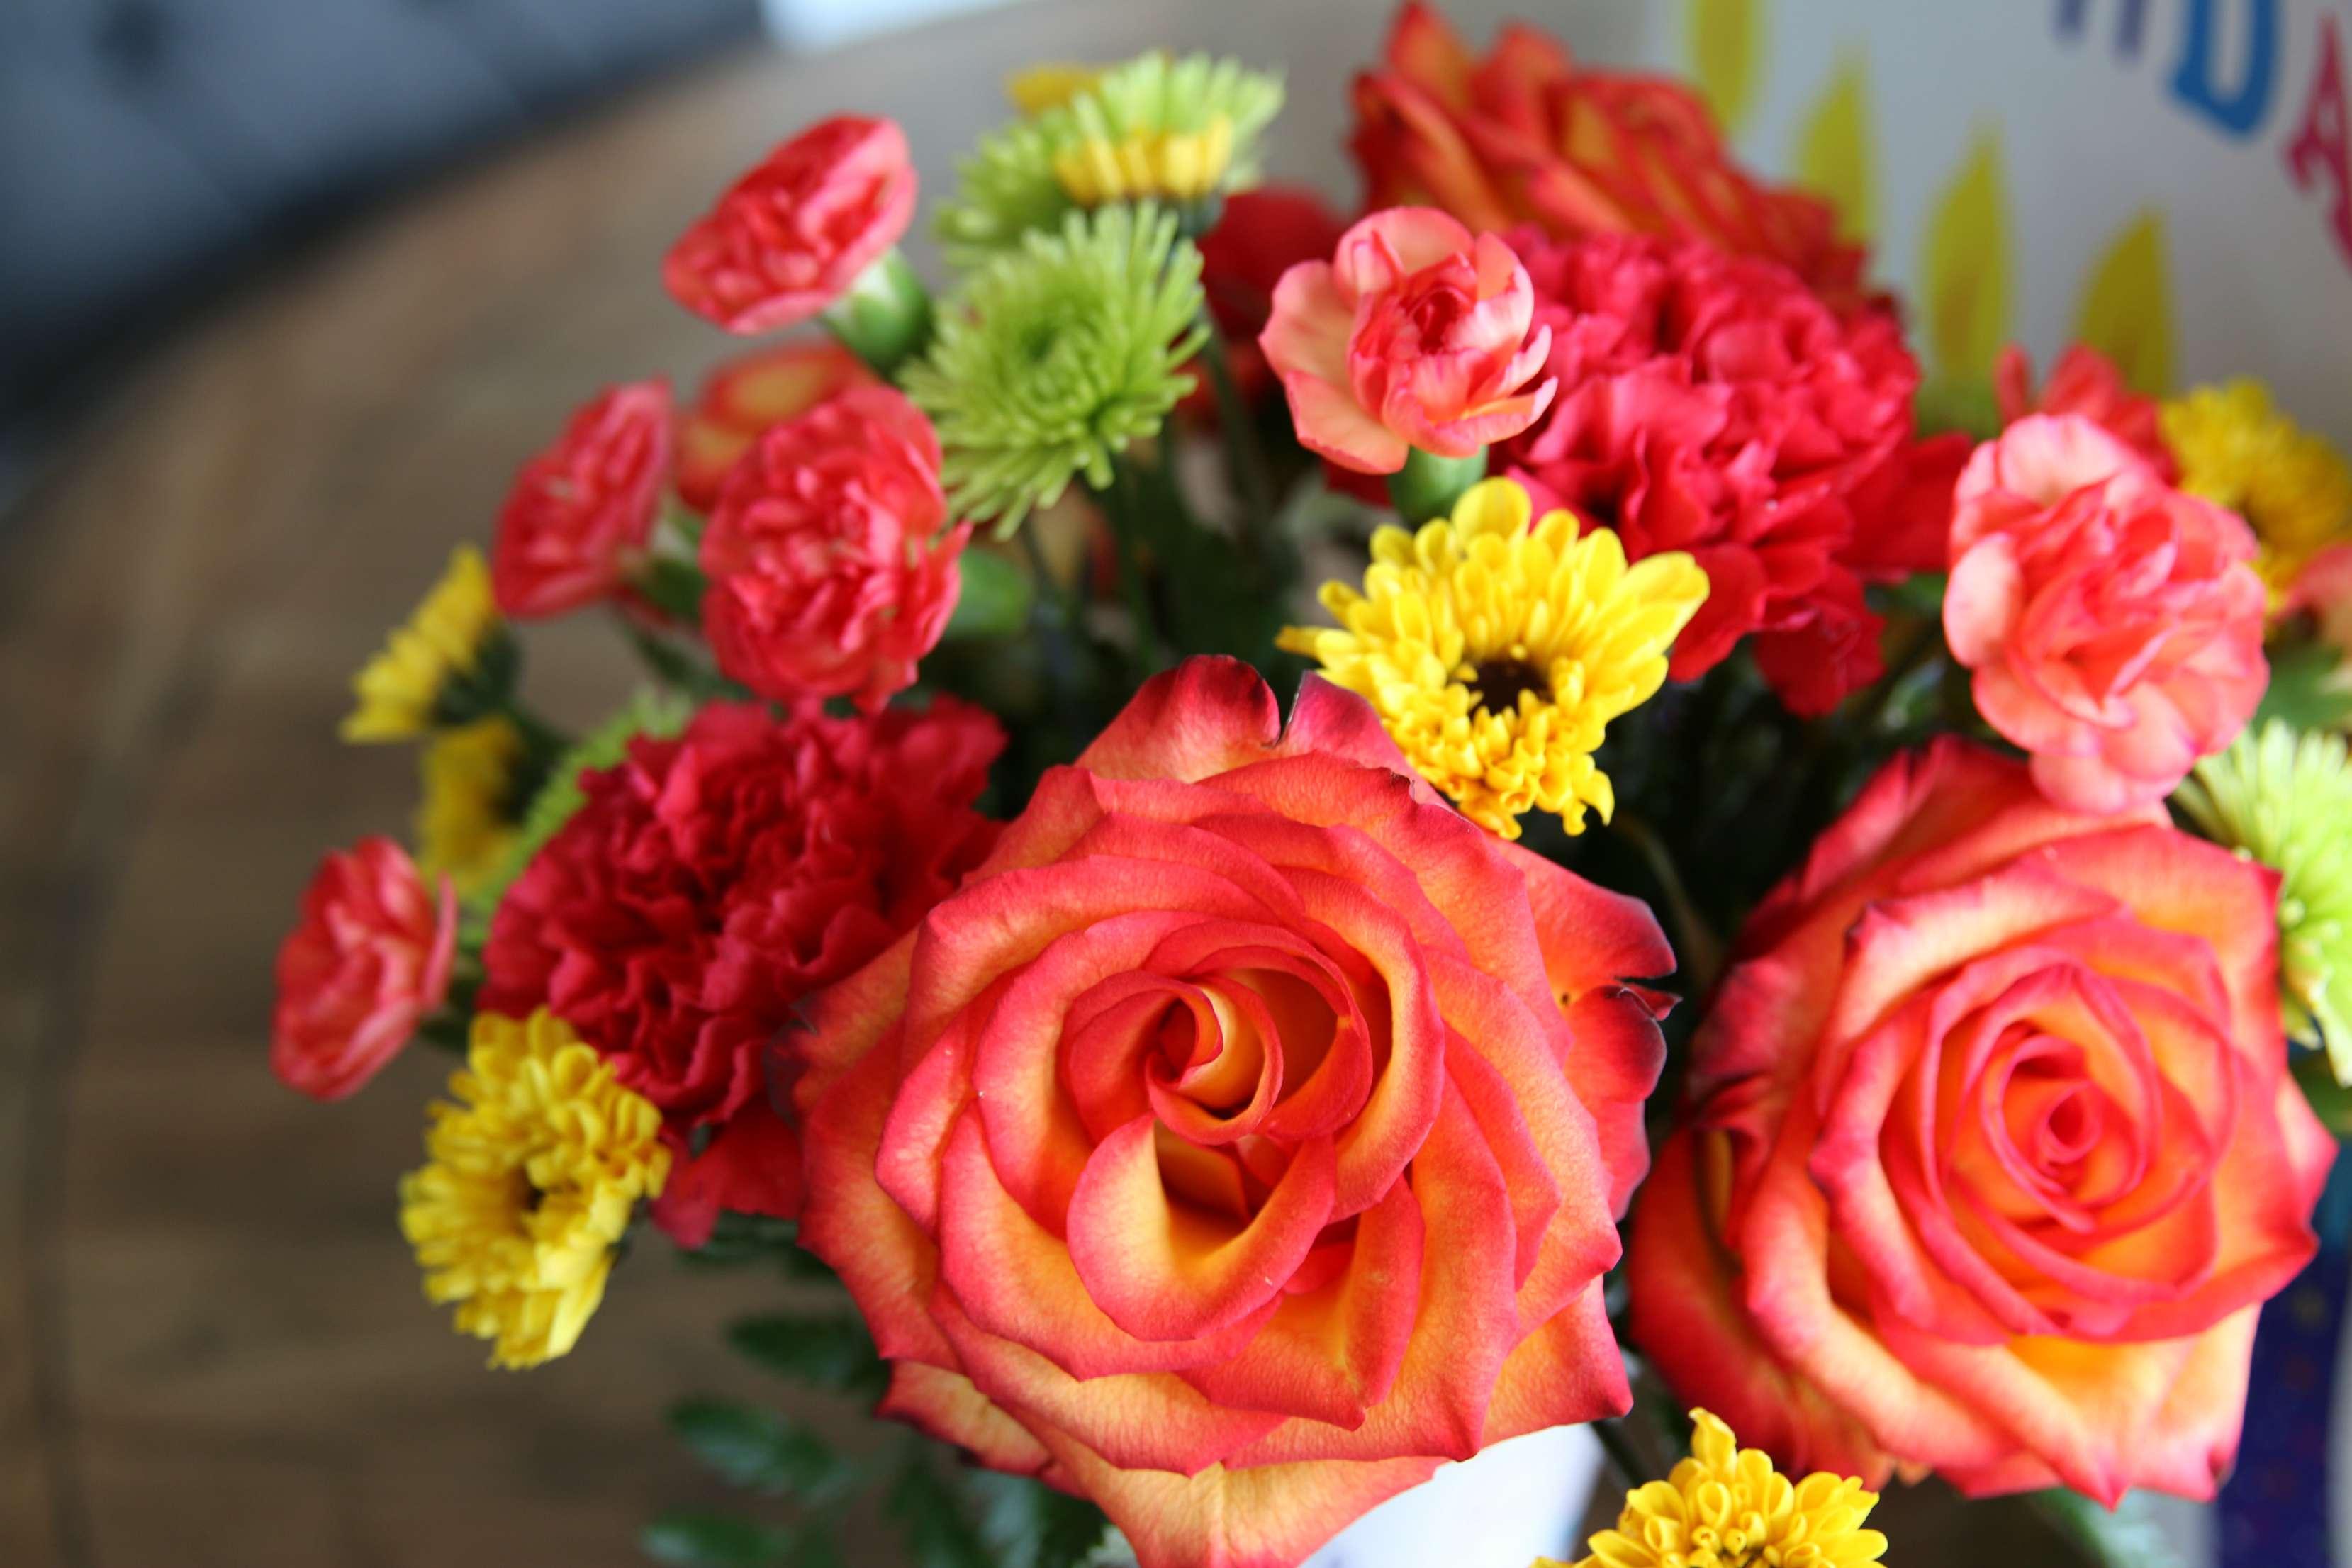 Teleflora Fun 'n Festive Bouquet review